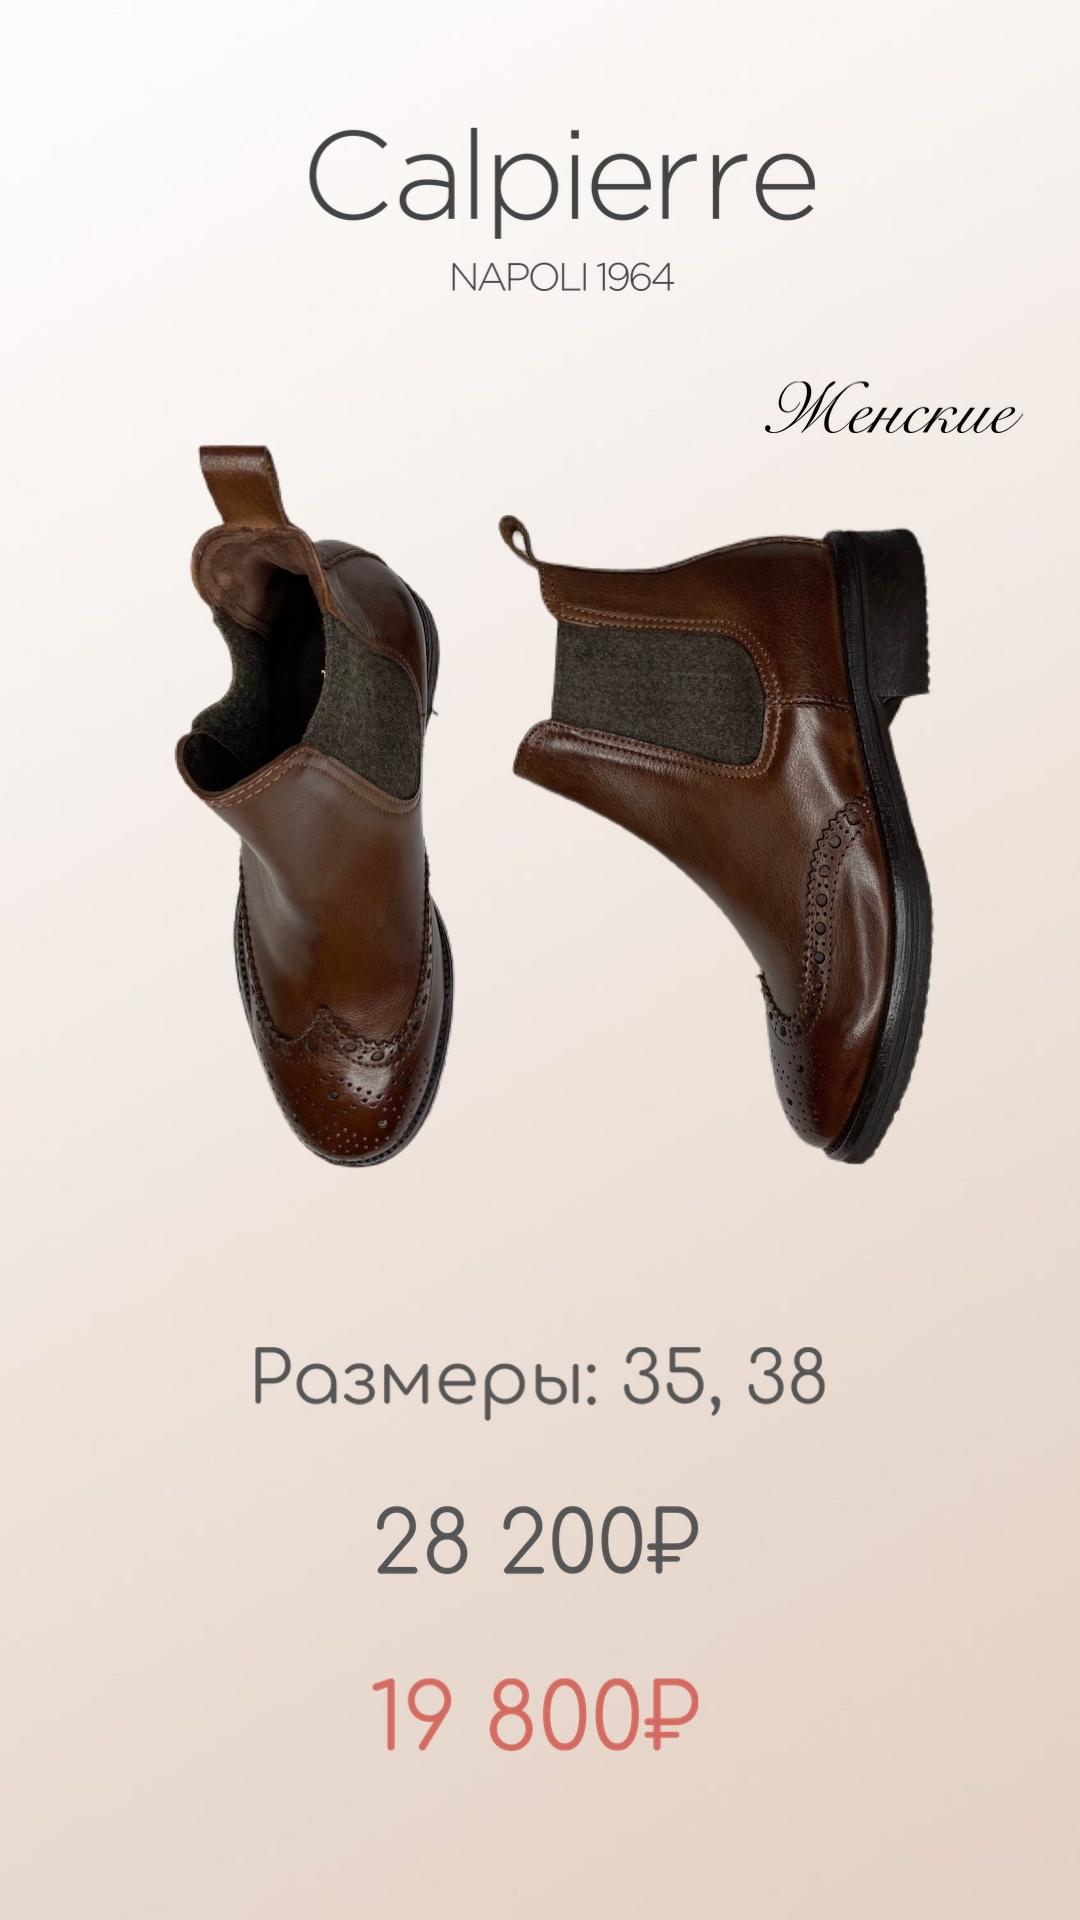 gallery_1_pust-ves-mir-budet-u-vashih-nog-6